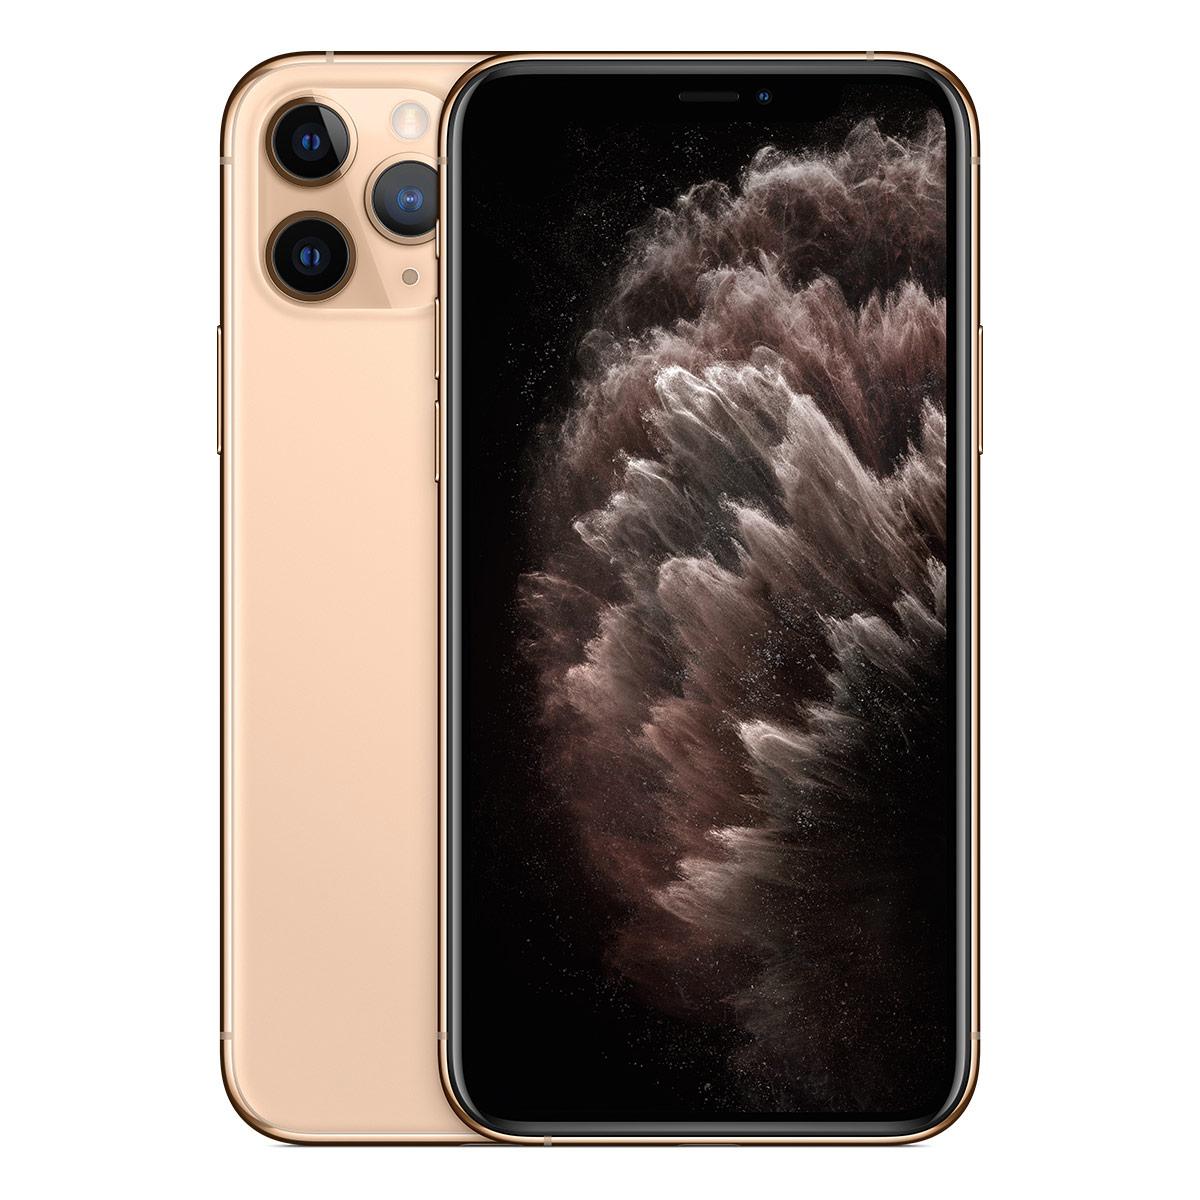 Apple iPhone 11 Pro 256GB Gold - Unlocked